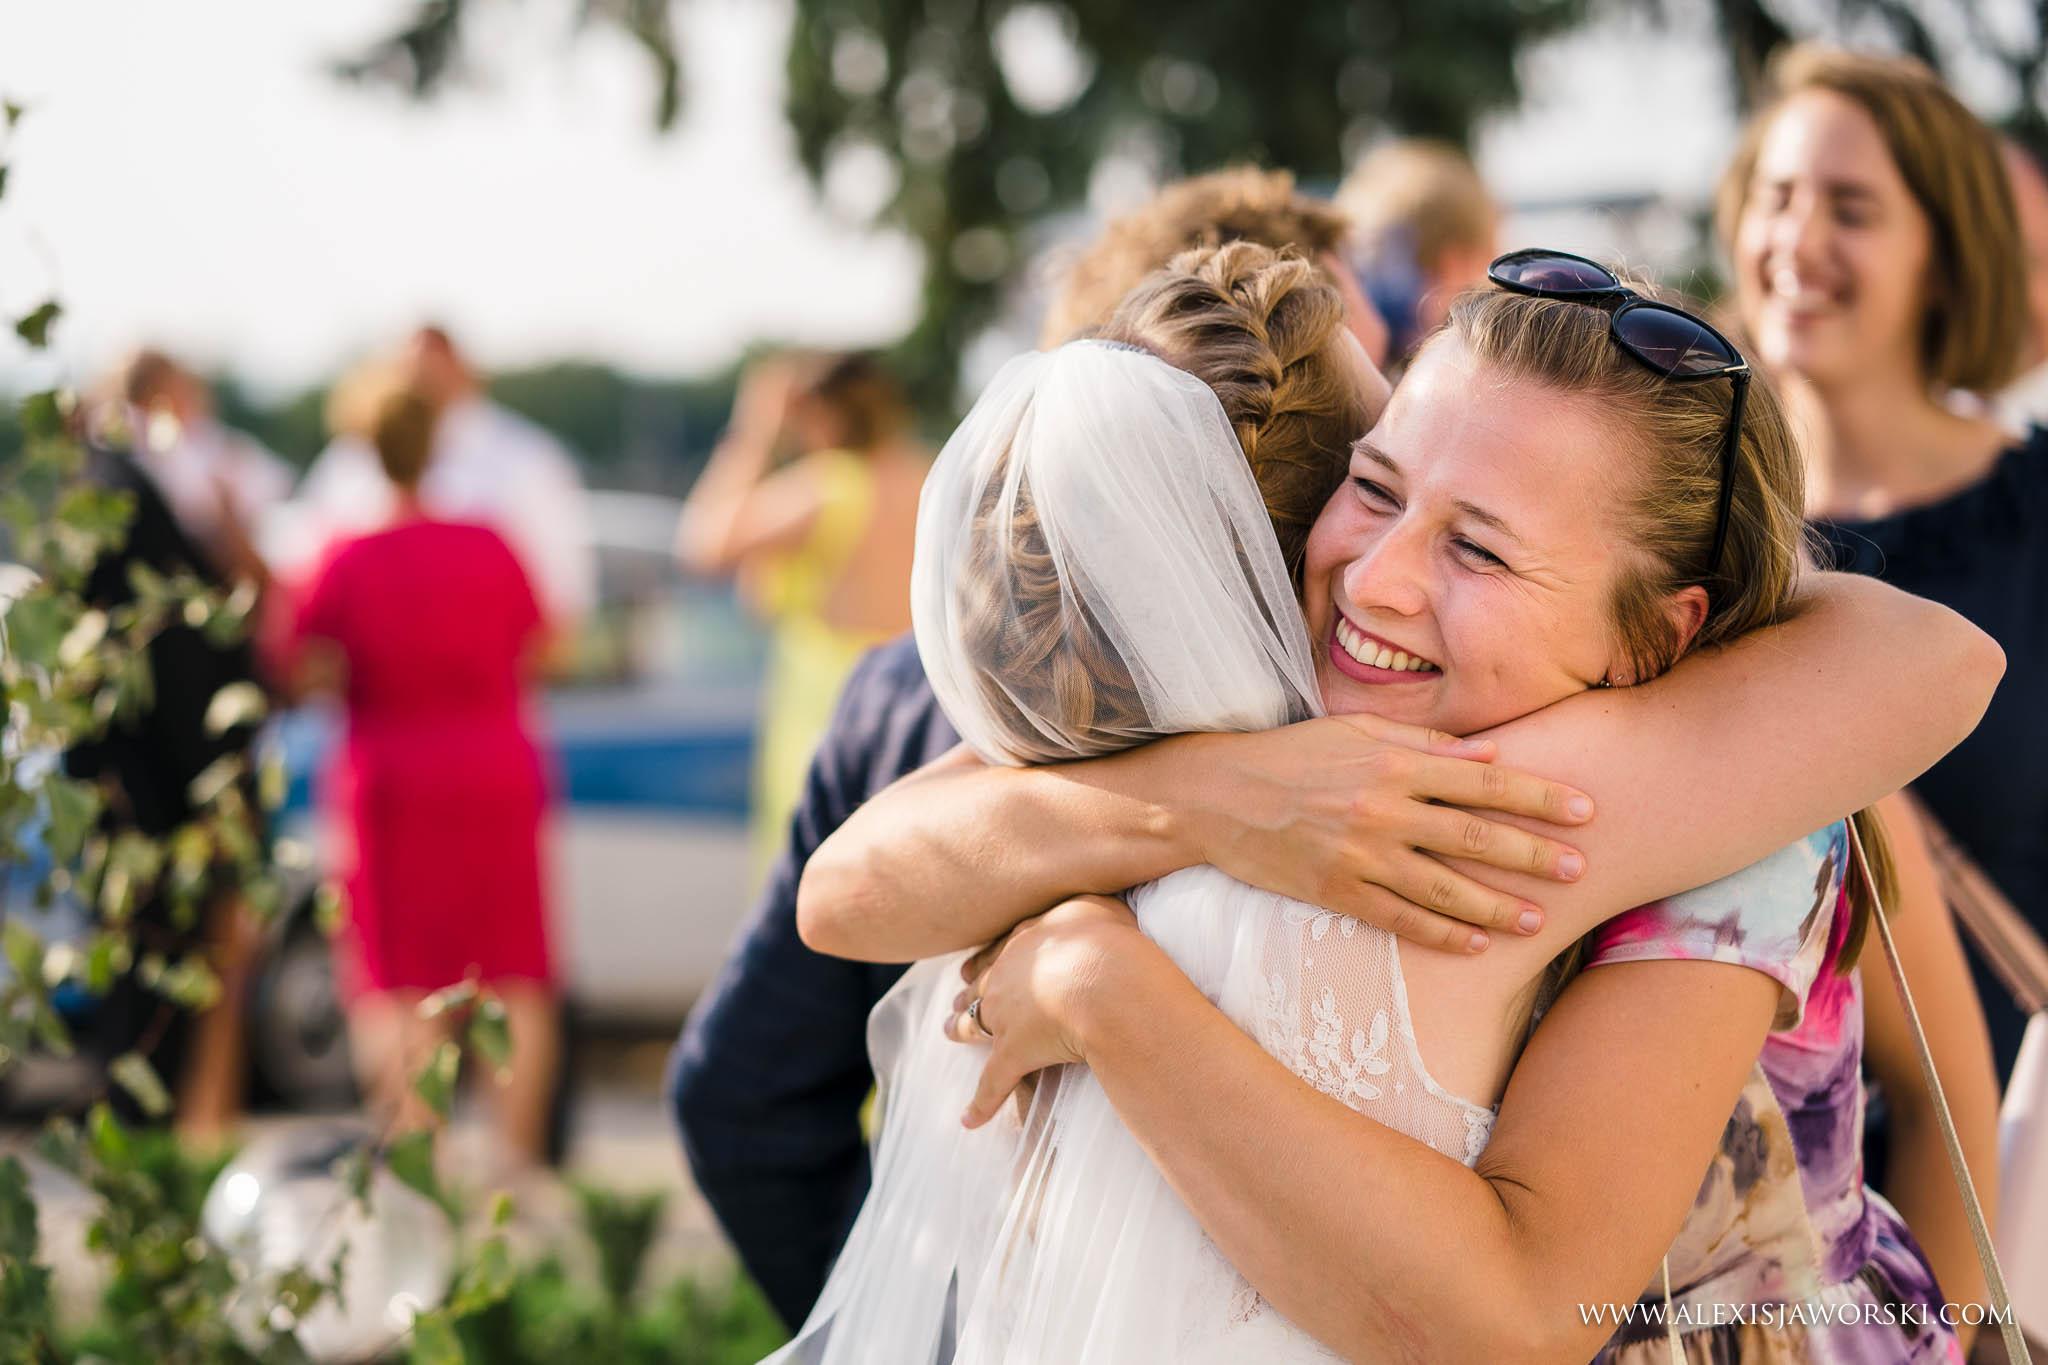 friend congratulating bride